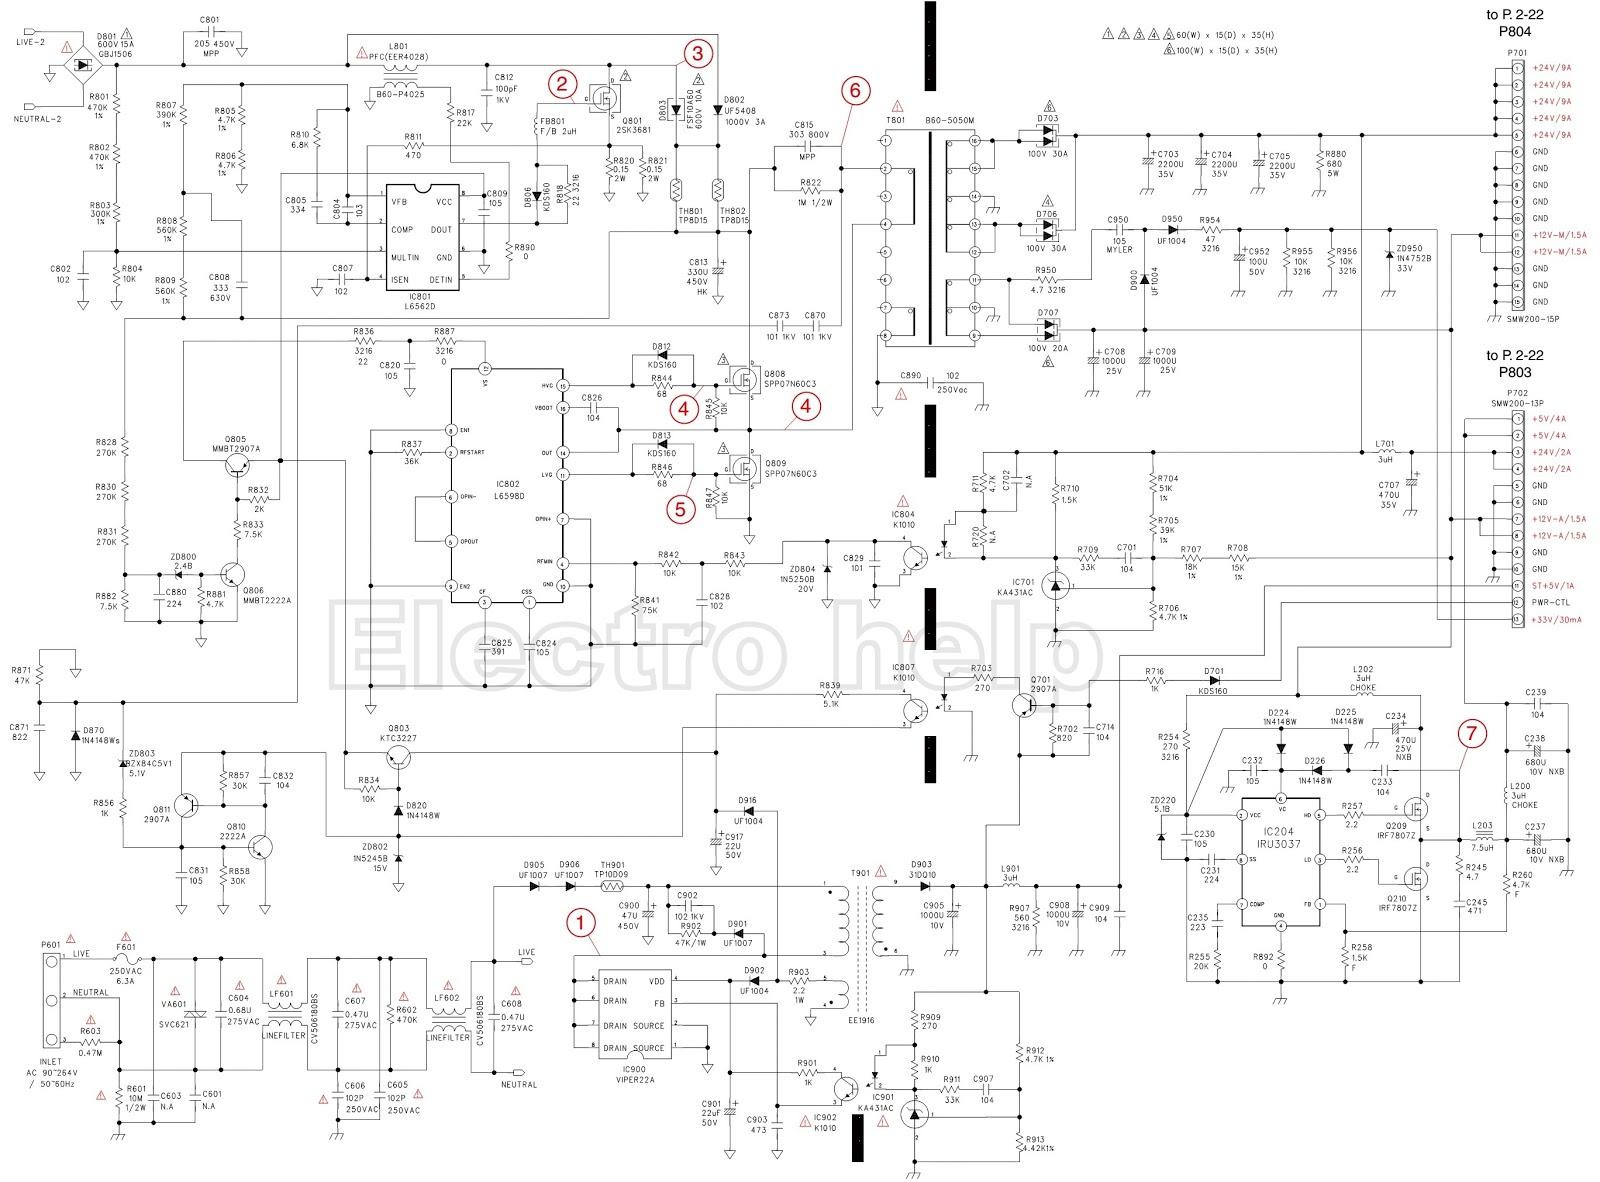 small resolution of  westinghouse tv schematic circuit diagram on insignia tv schematic vizio tv schematic